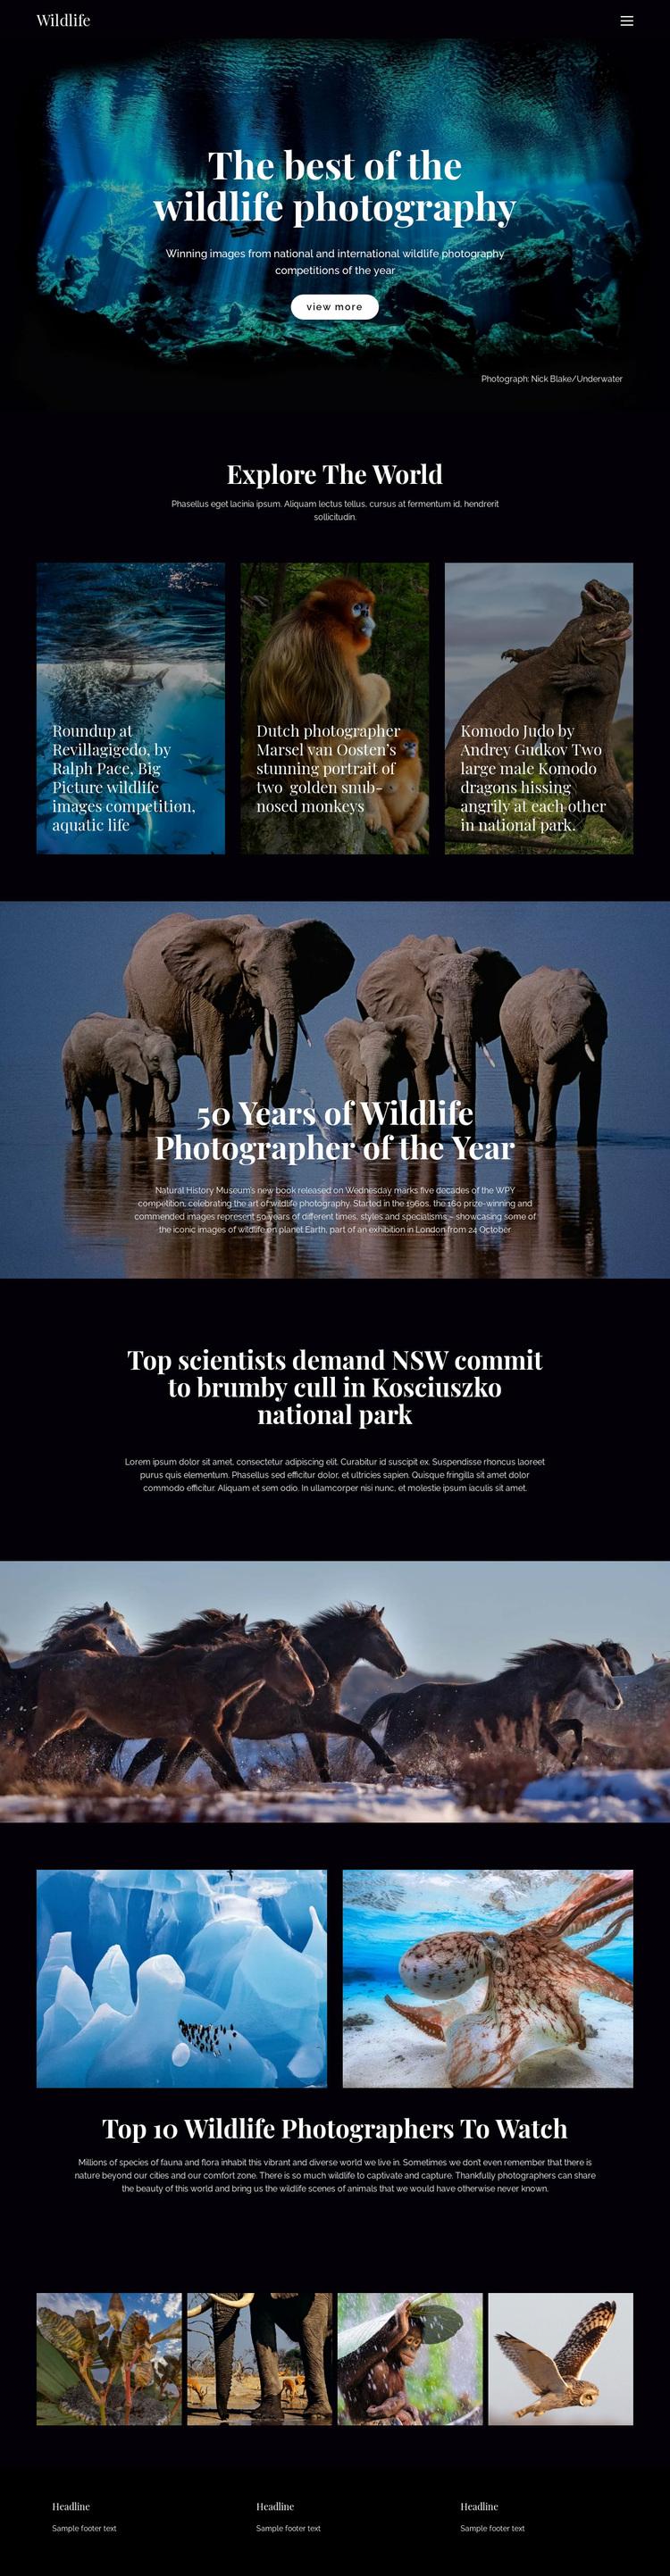 Wildlife and nature Website Design